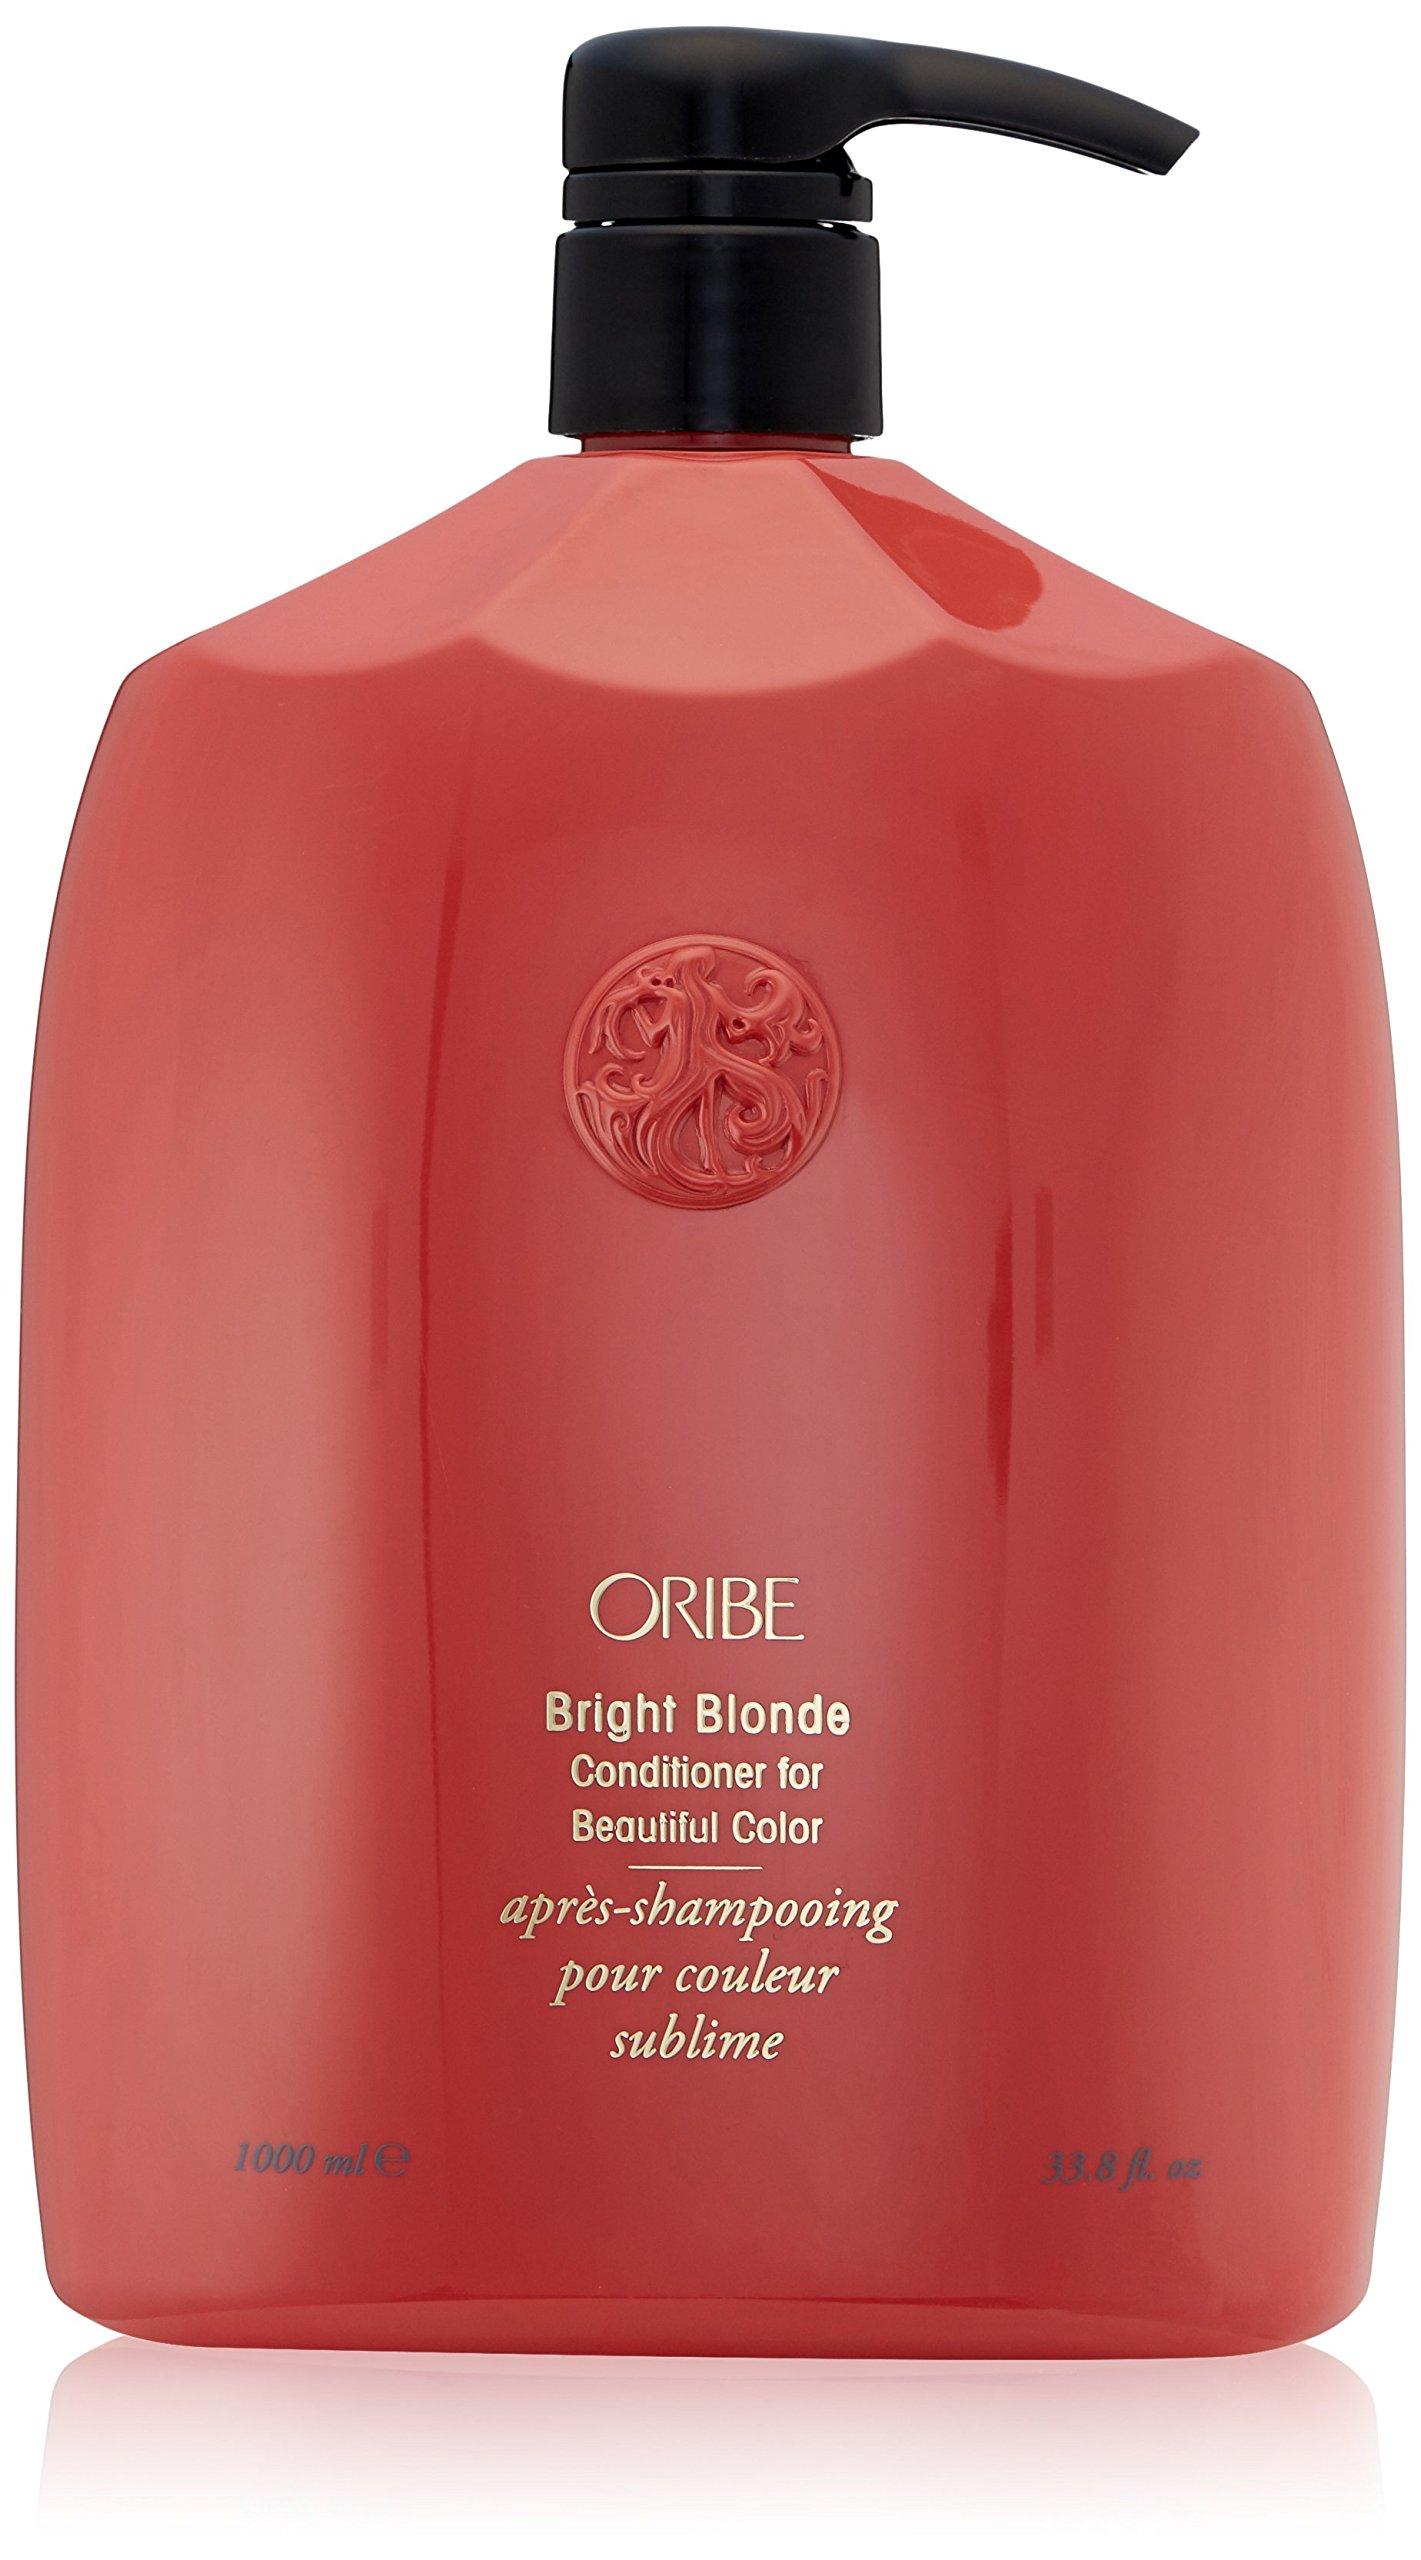 AmazonUsluxury ORIBE Bright Blonde Conditioner for Beautiful Color, 33.8 Fl Oz